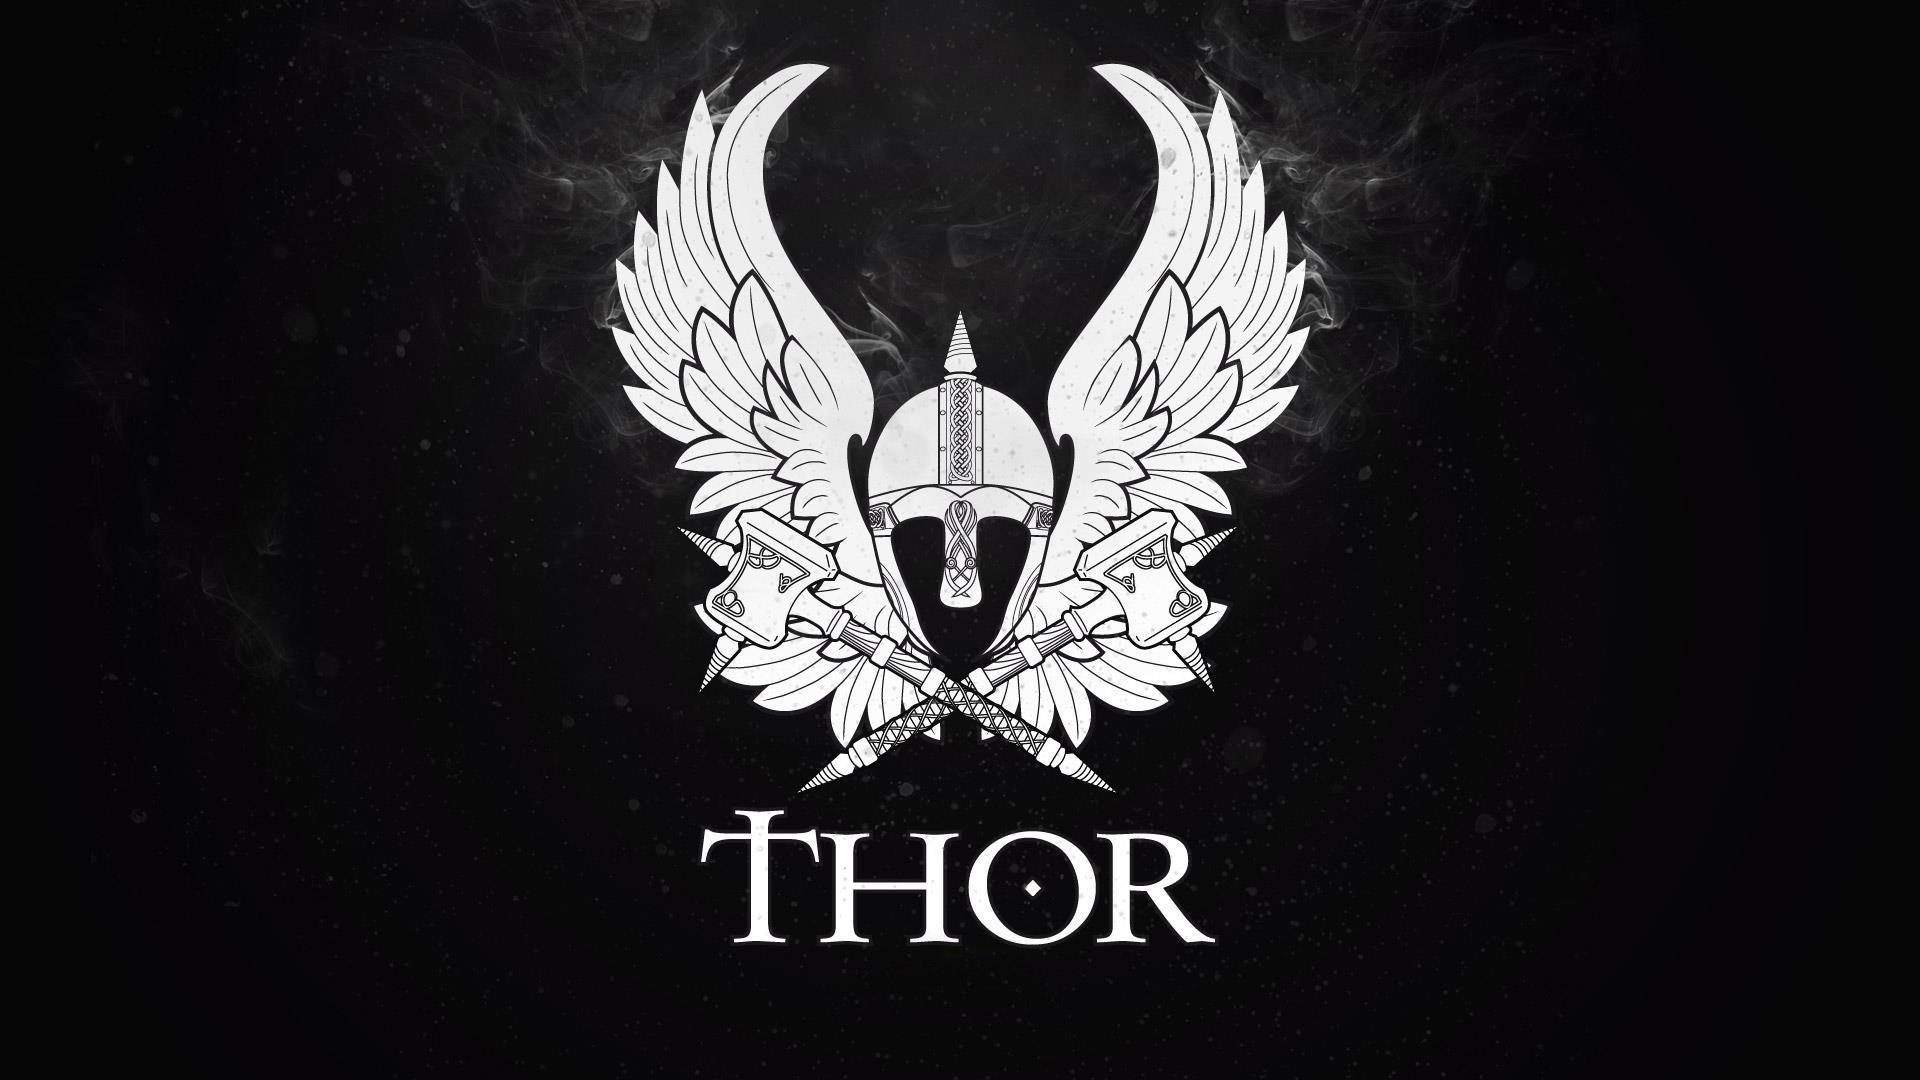 Free Thor Wallpaper HD for Desktop (17)